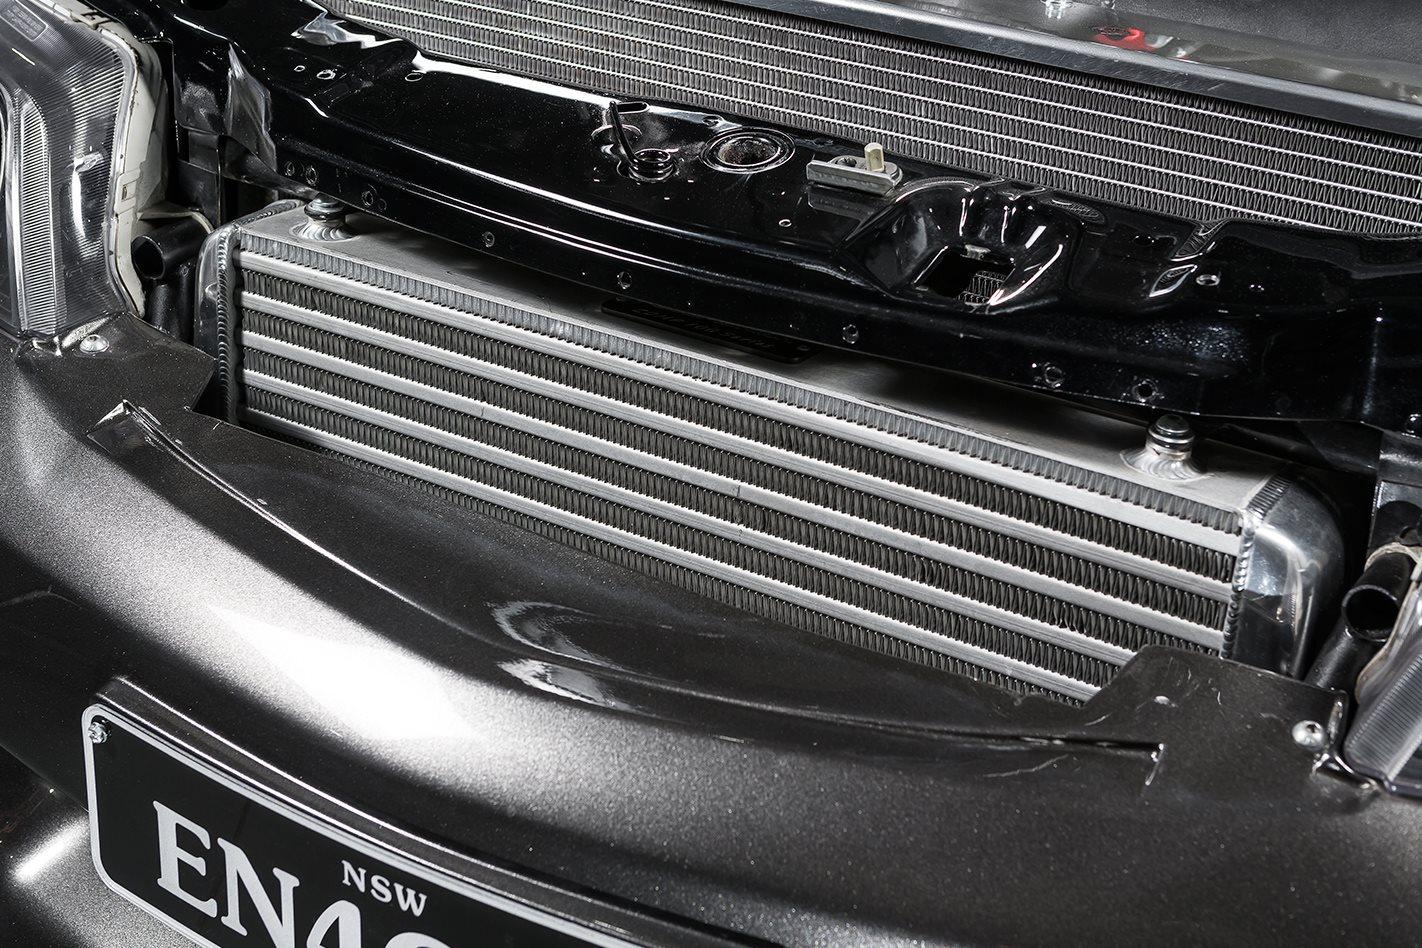 HSV Grange radiator